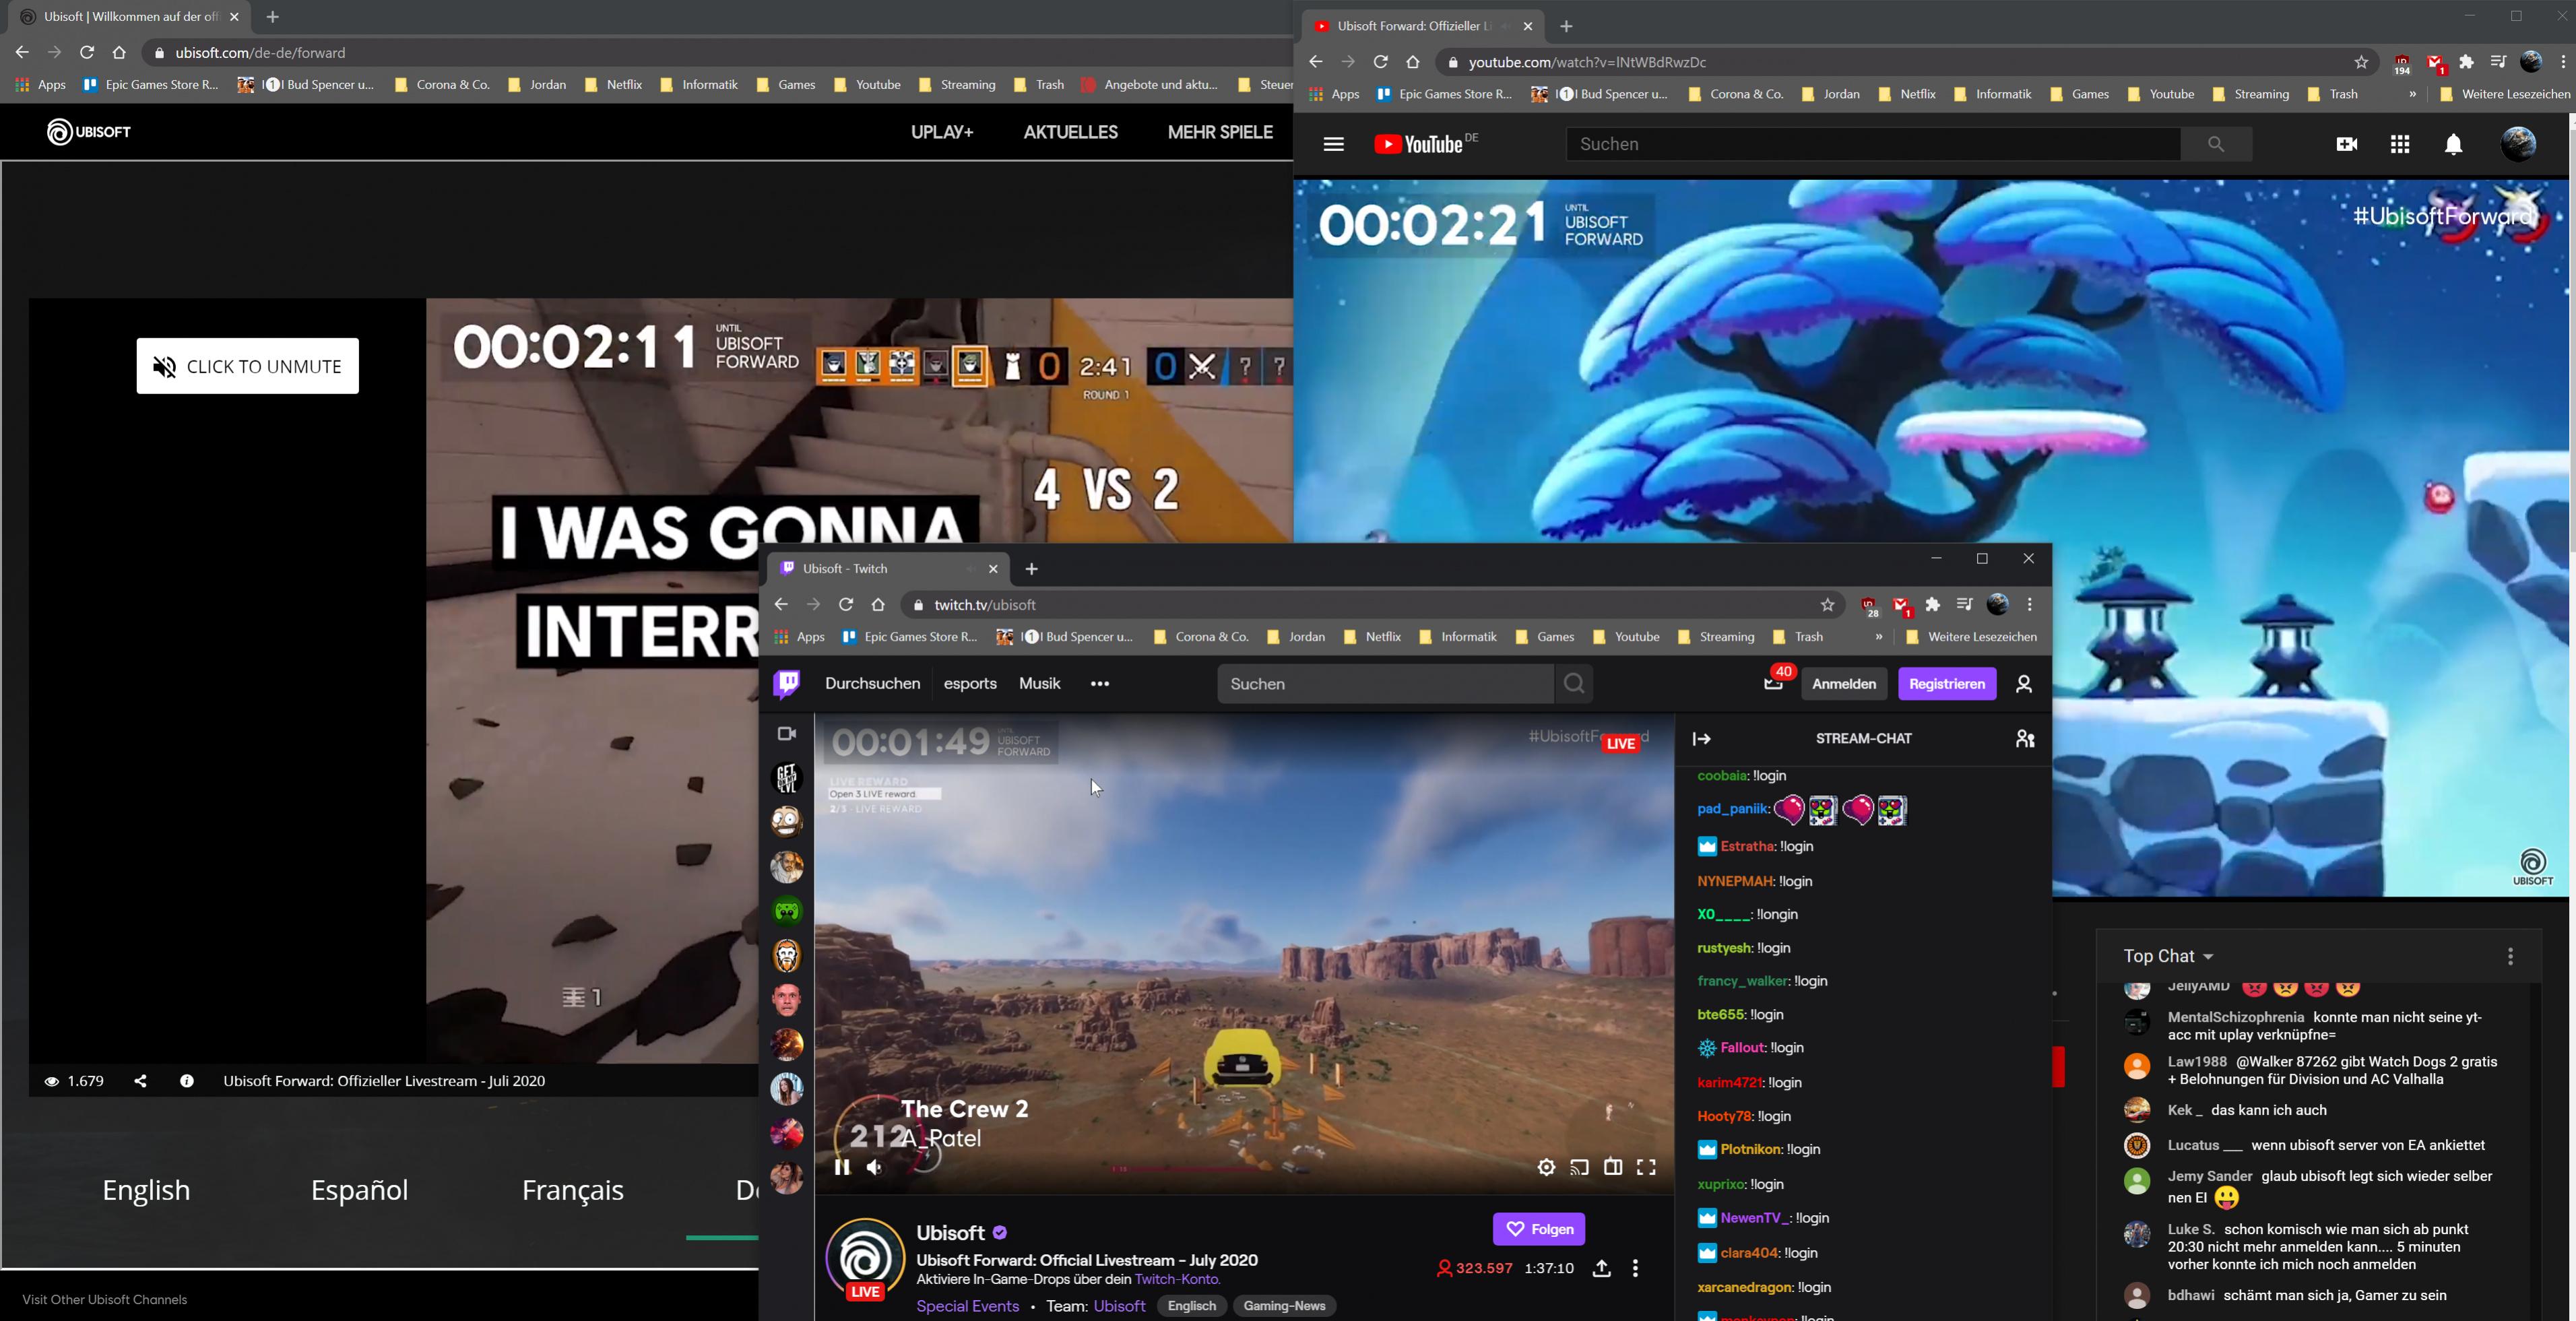 2020-07-12 20_58_35-Ubisoft Forward_ Offizieller Livestream - Juli 2020 - YouTube.jpg